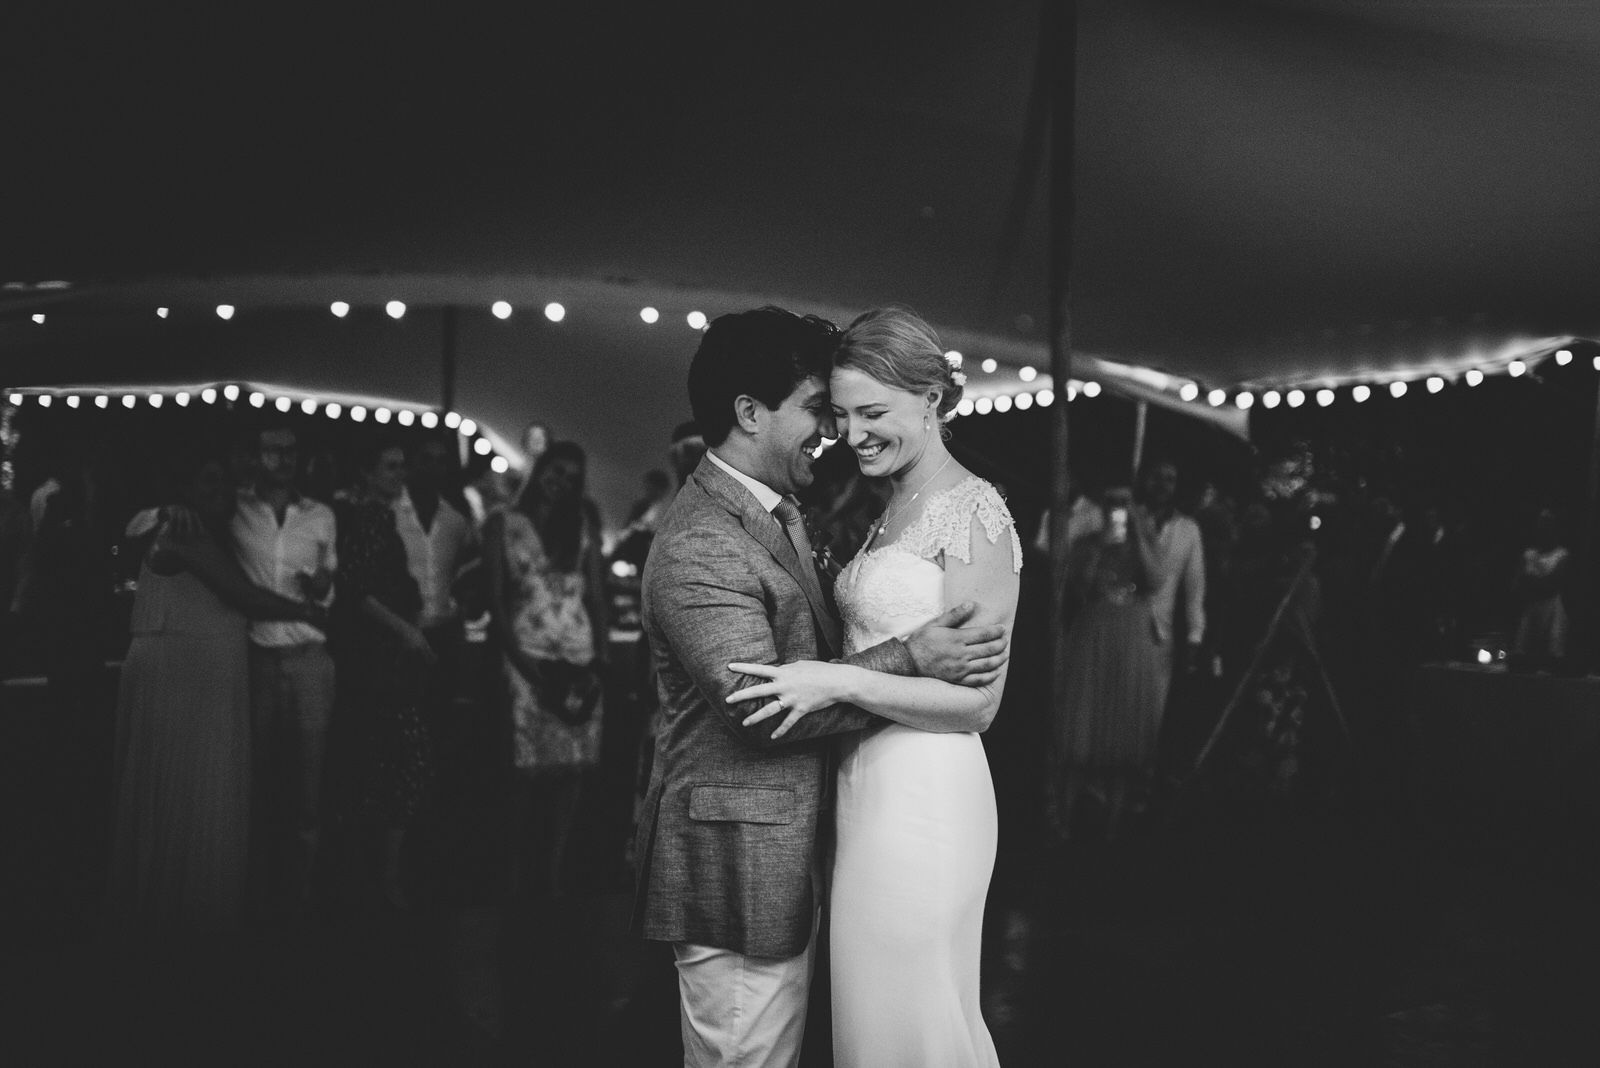 040-LOURMARIN-WEDDING-PHOTOGRAPHER-PROVENCE-WEDDING-ALTERNATIVE-WEDDING-PHOTOGRAPHY-FRANCE-PROVENCE-GARDEN-WEDDING.JPG